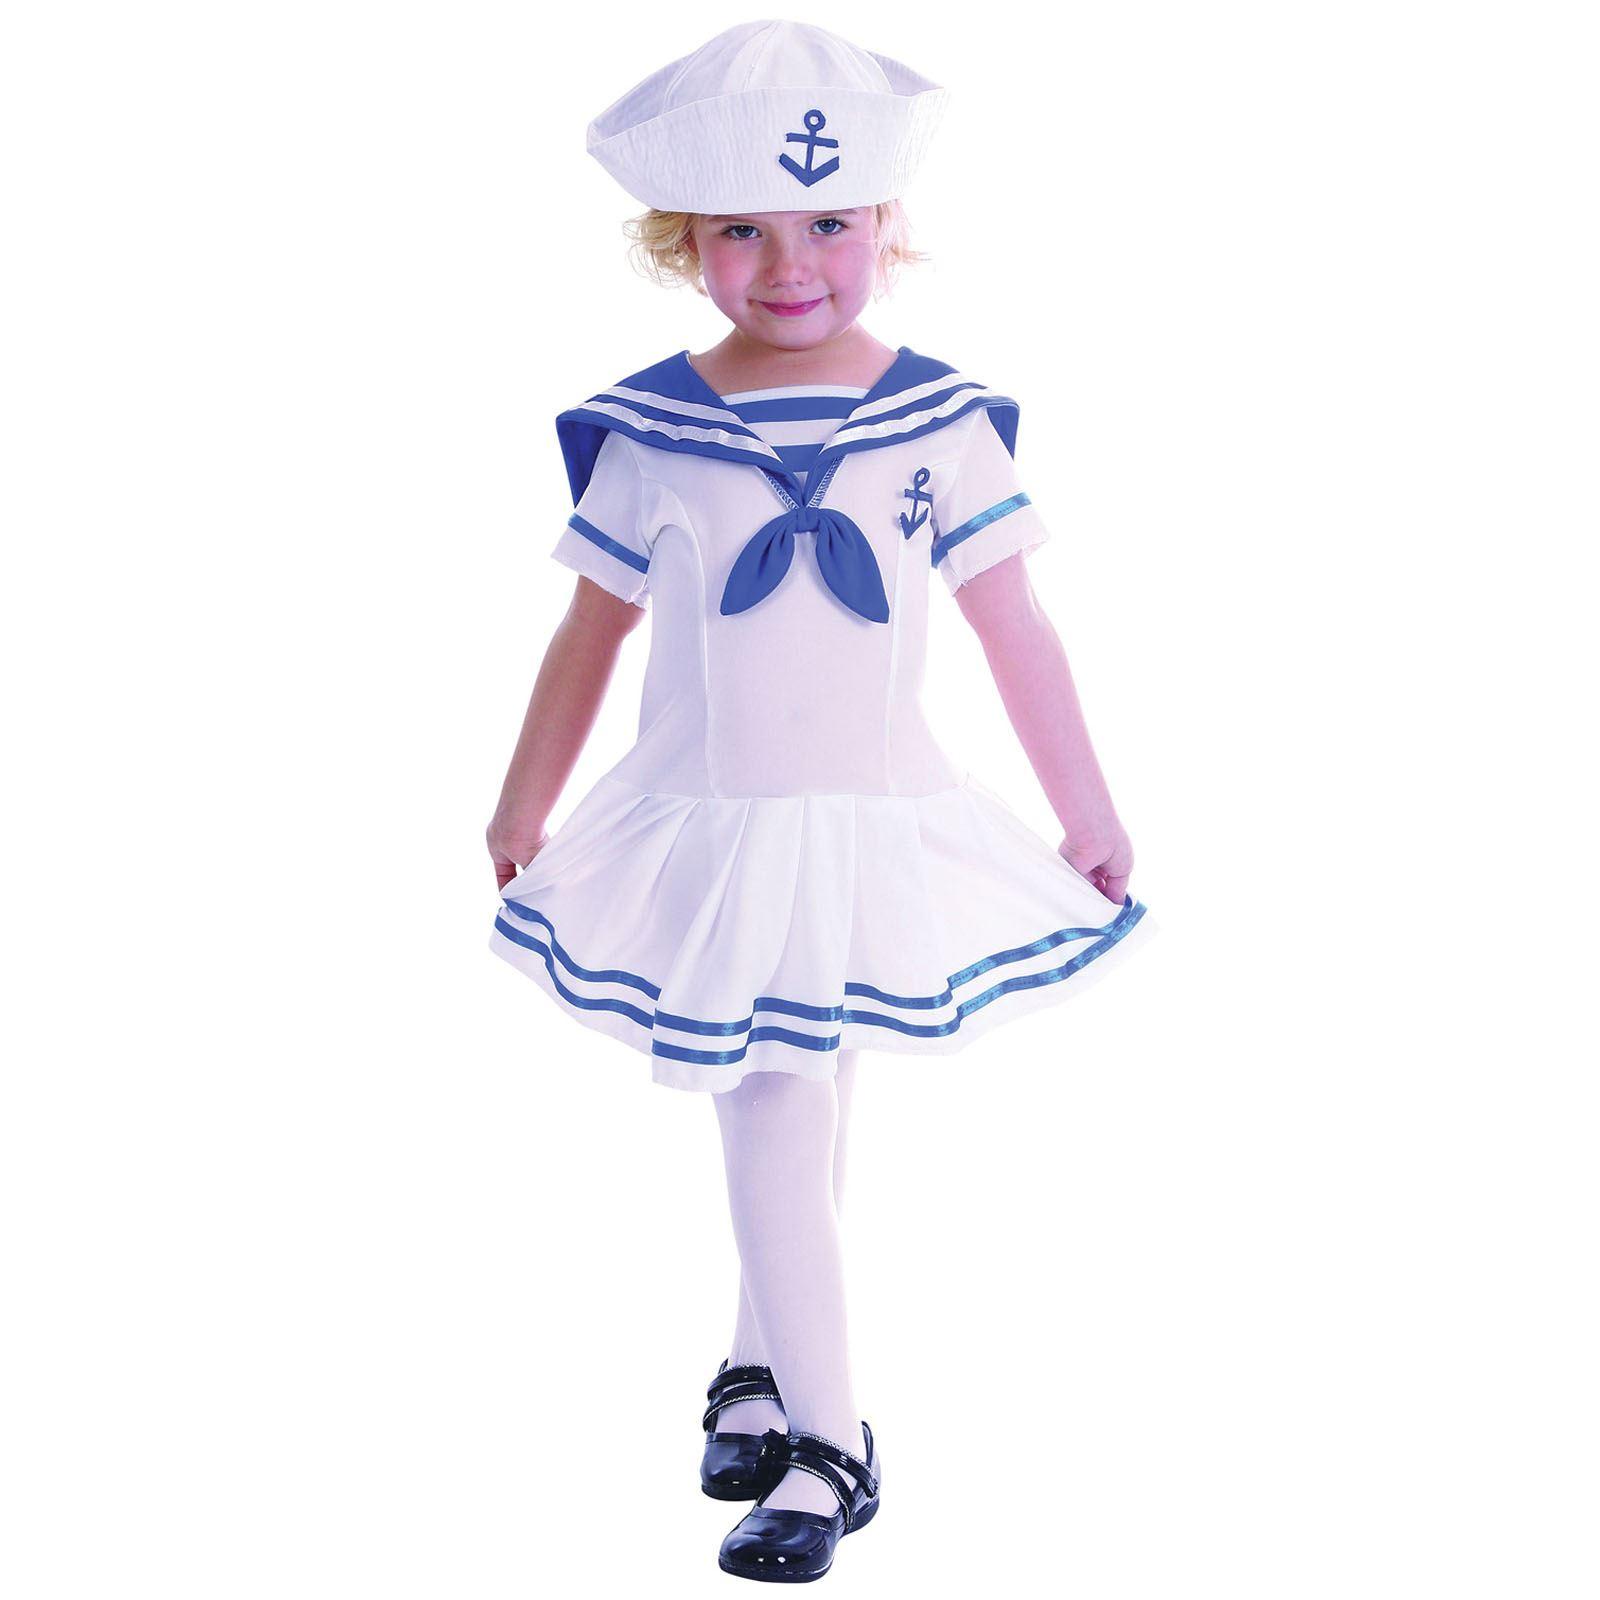 Kids Military Marine Sailor Navy Toddler Boys Girls Fancy Dress ...